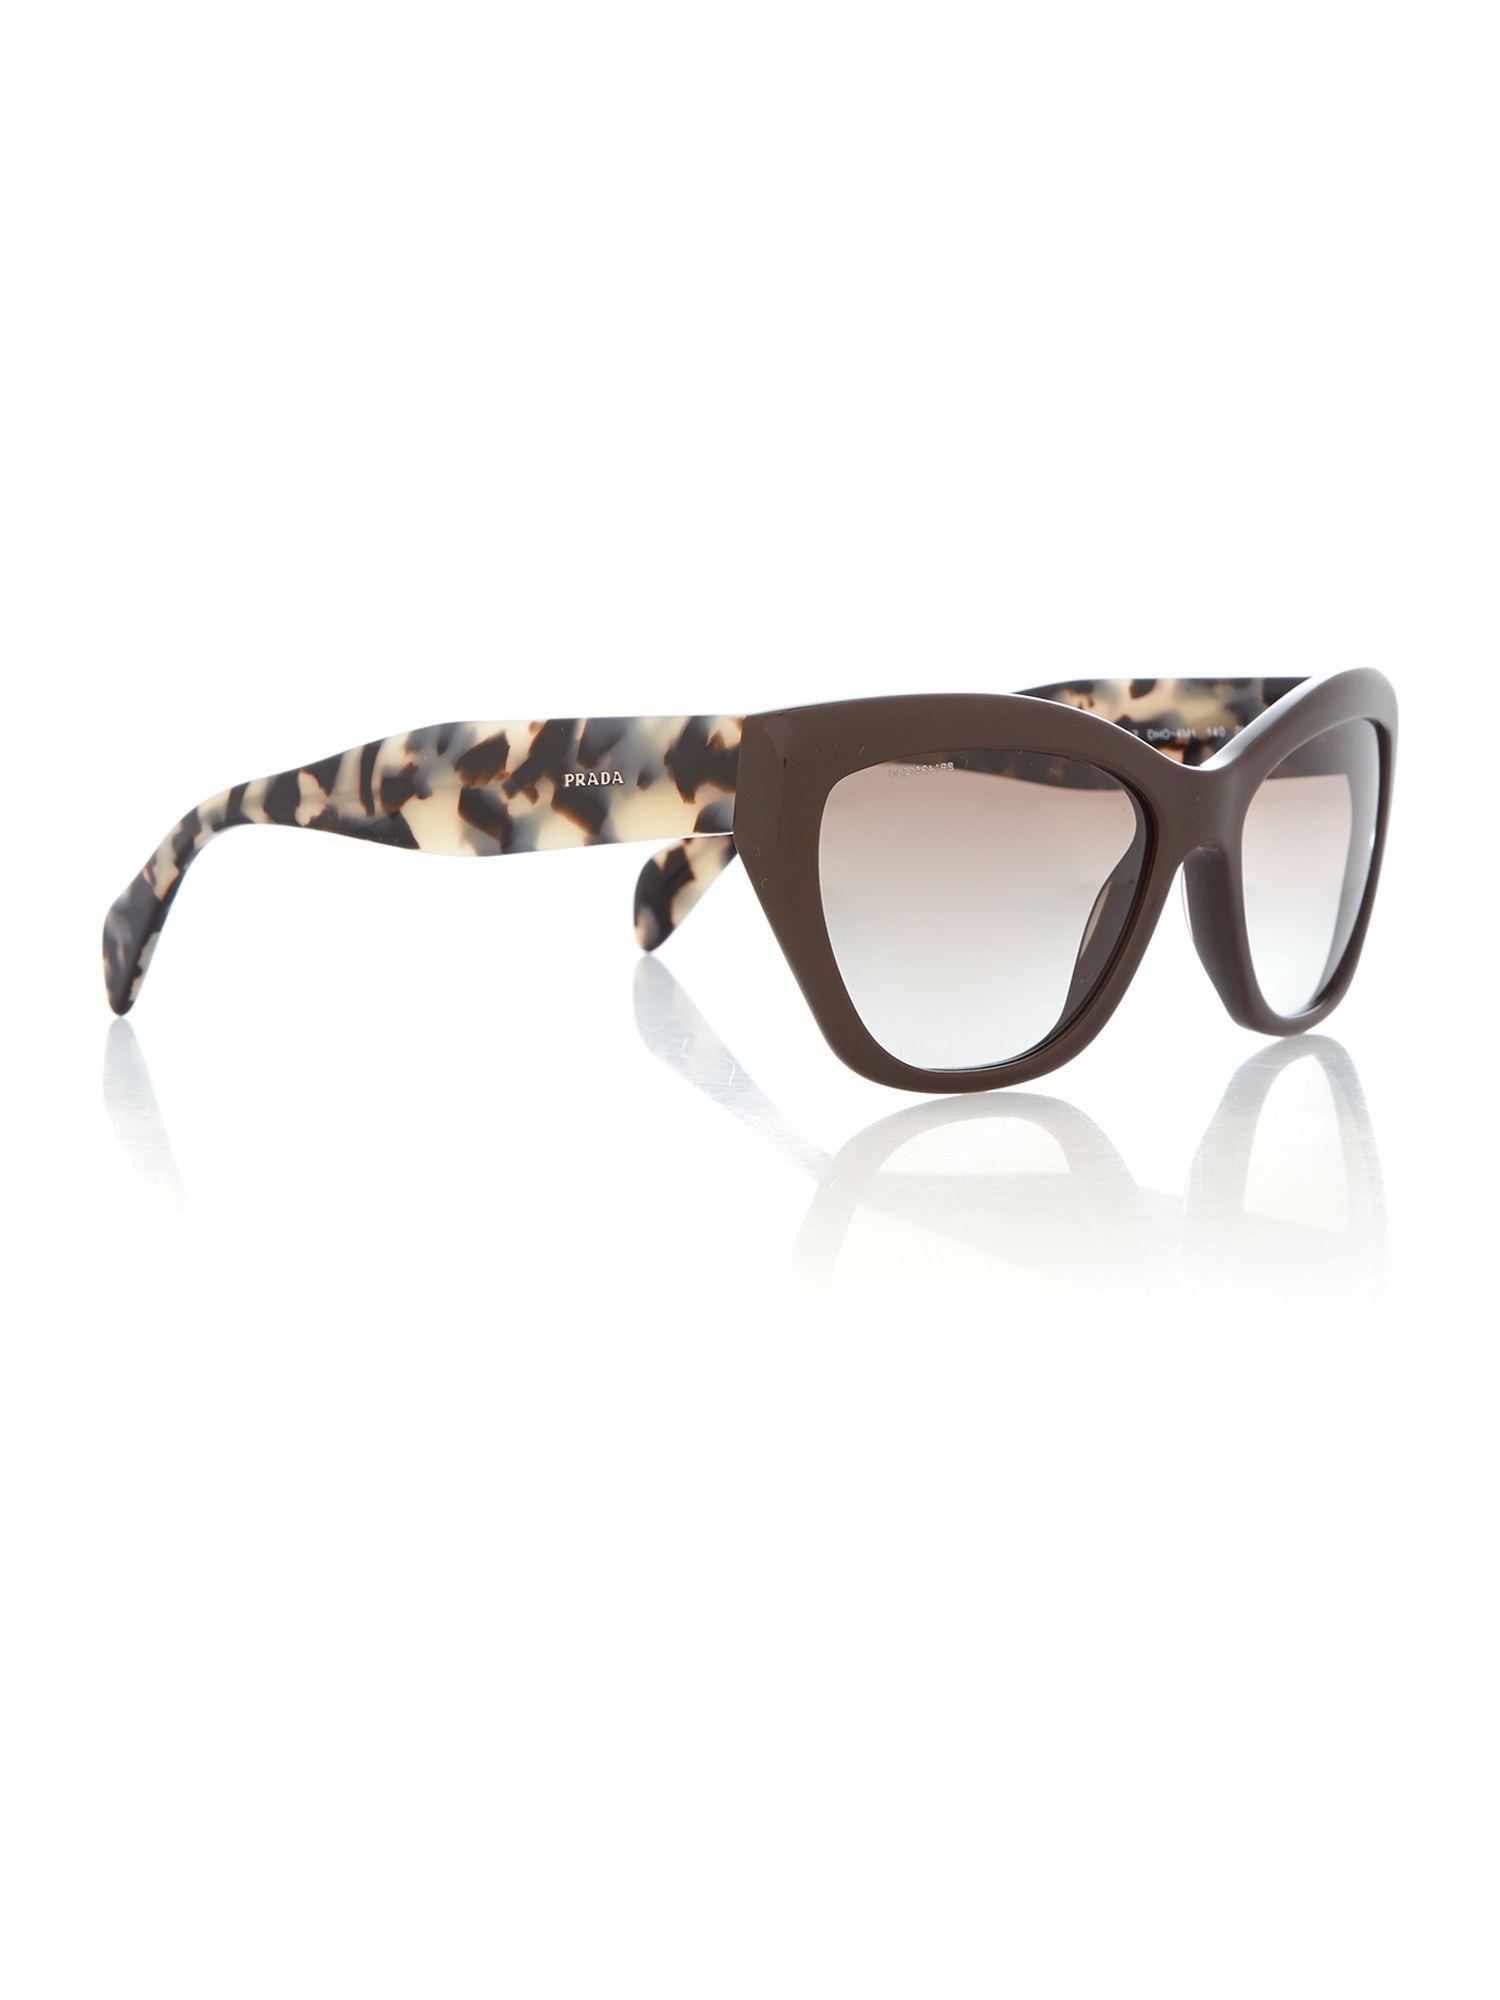 prada-sunglasses--ladies-cat-eye-sunglasses-product-1-16248905-0    Prada Cat Eye Sunglasses 2013